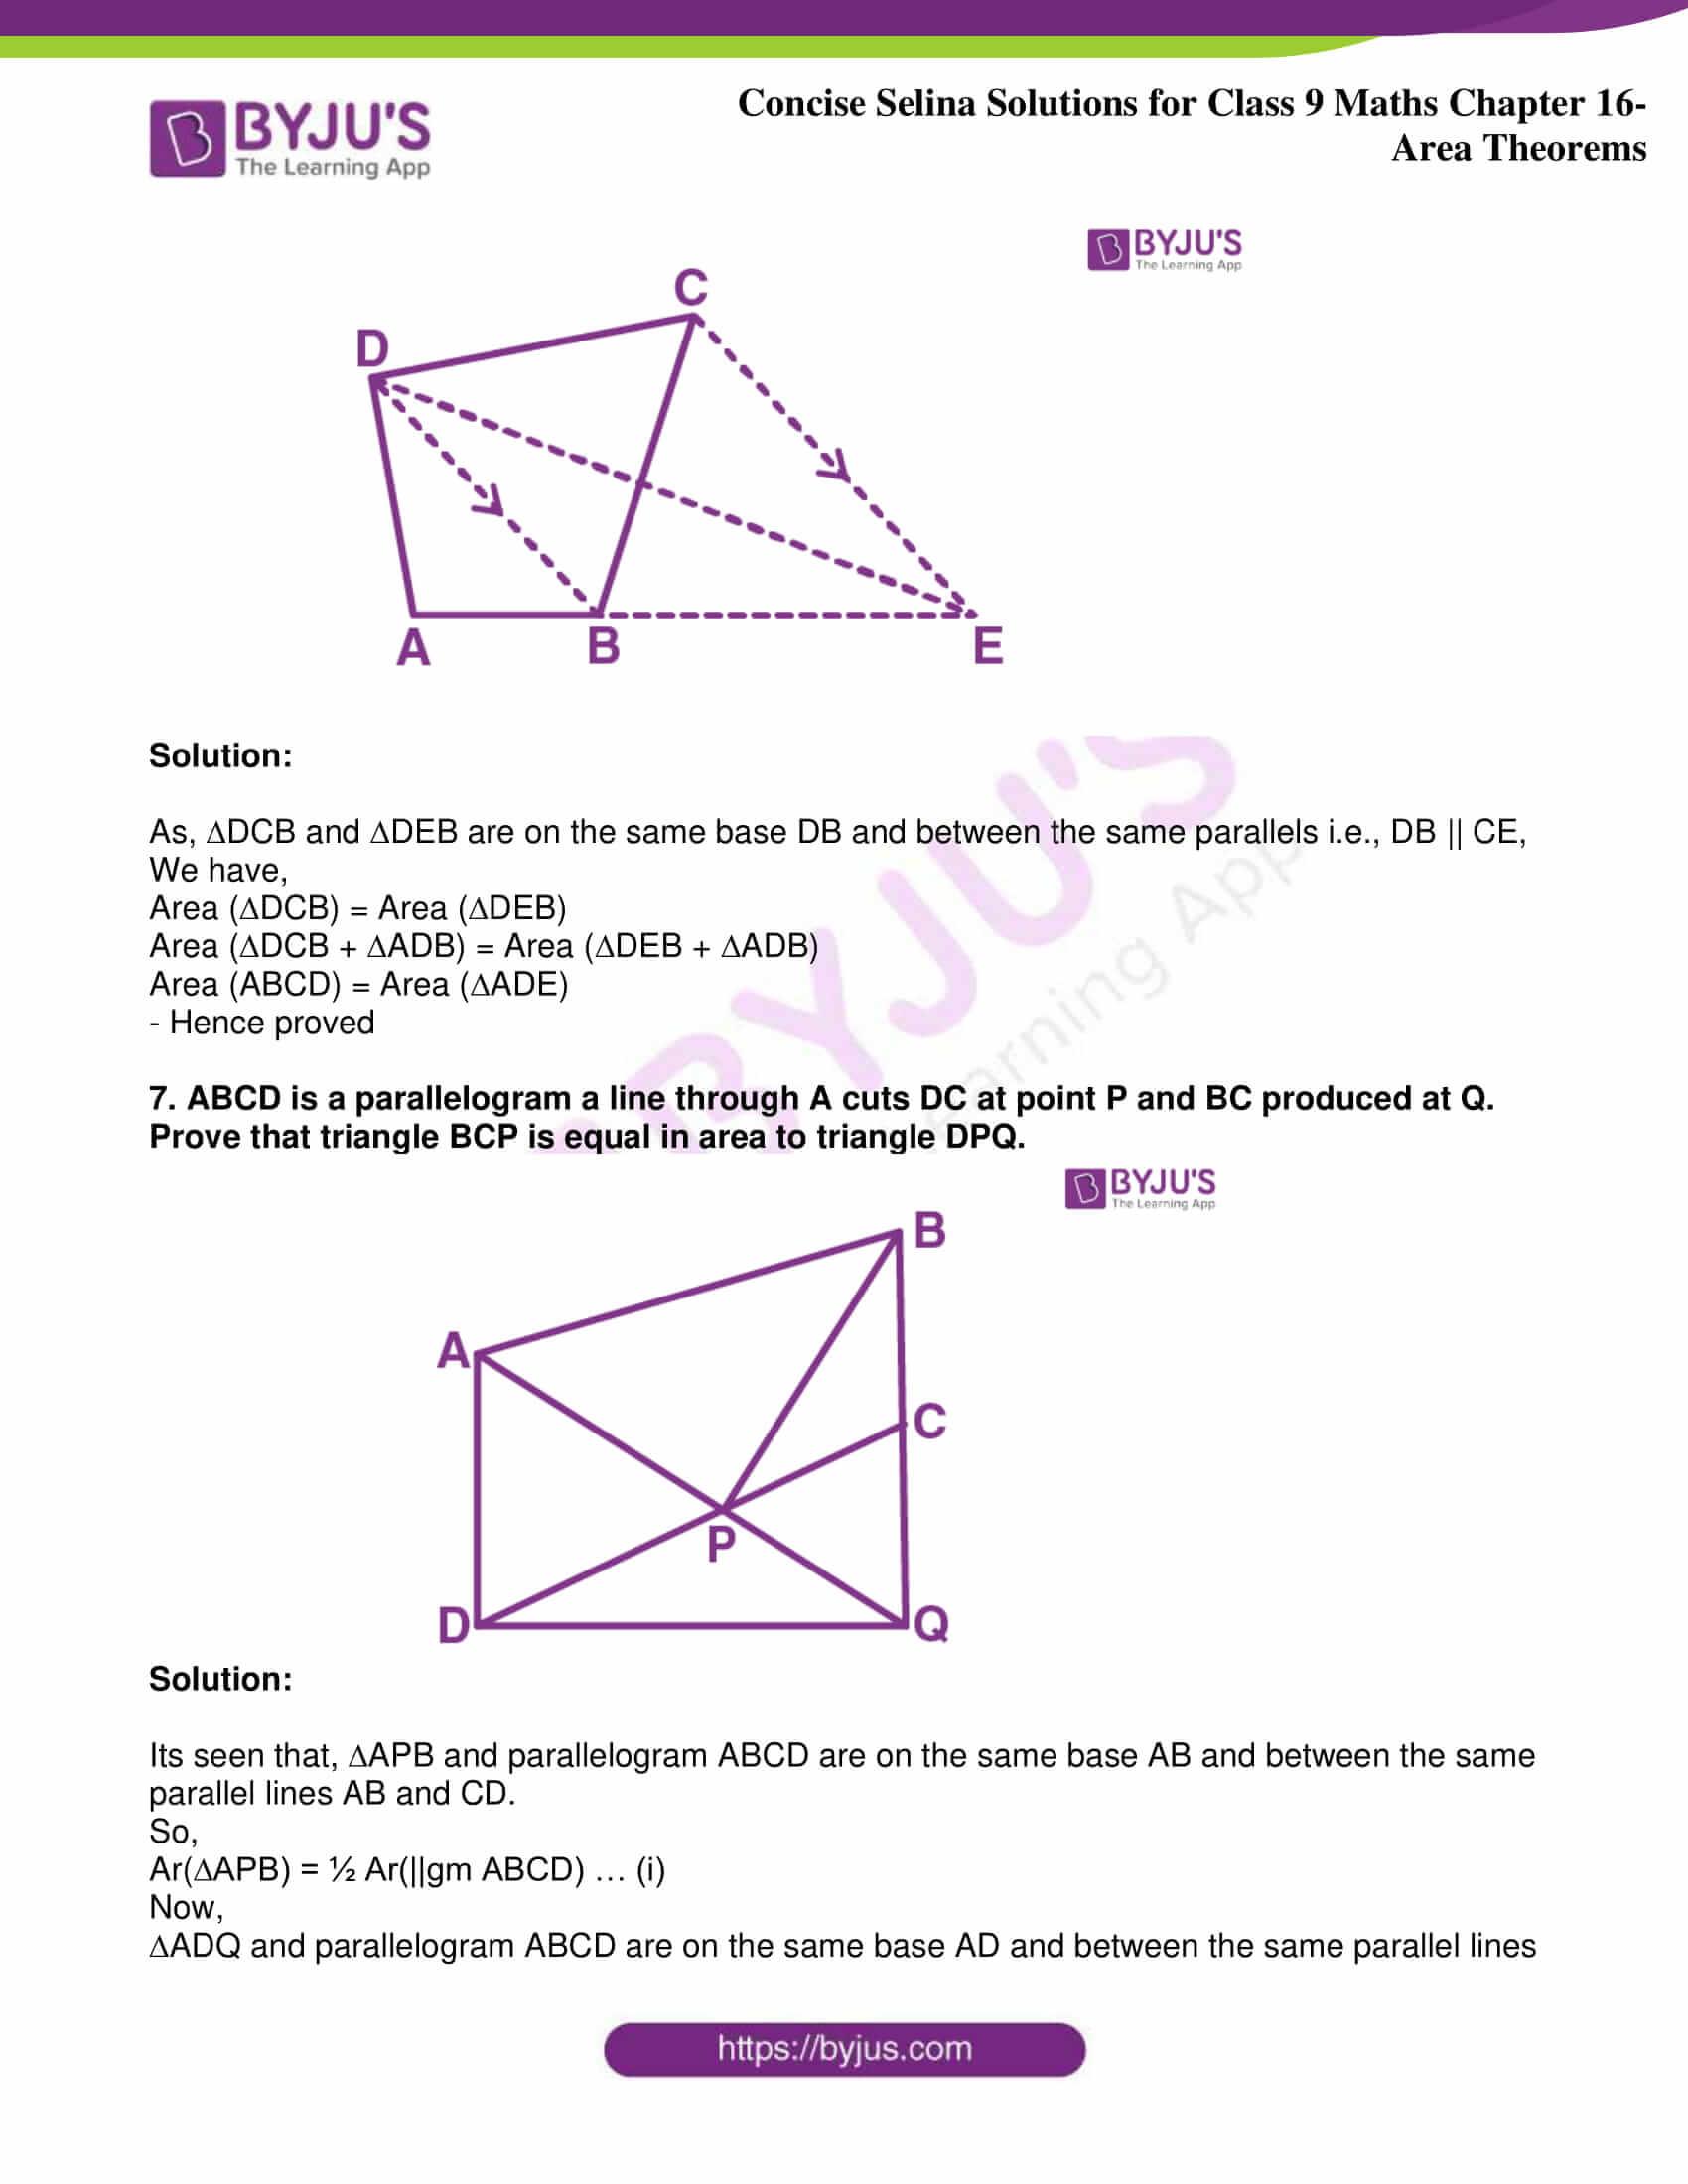 icse class 9 jun9 maths selina solutions chapter 16 area theorems 06